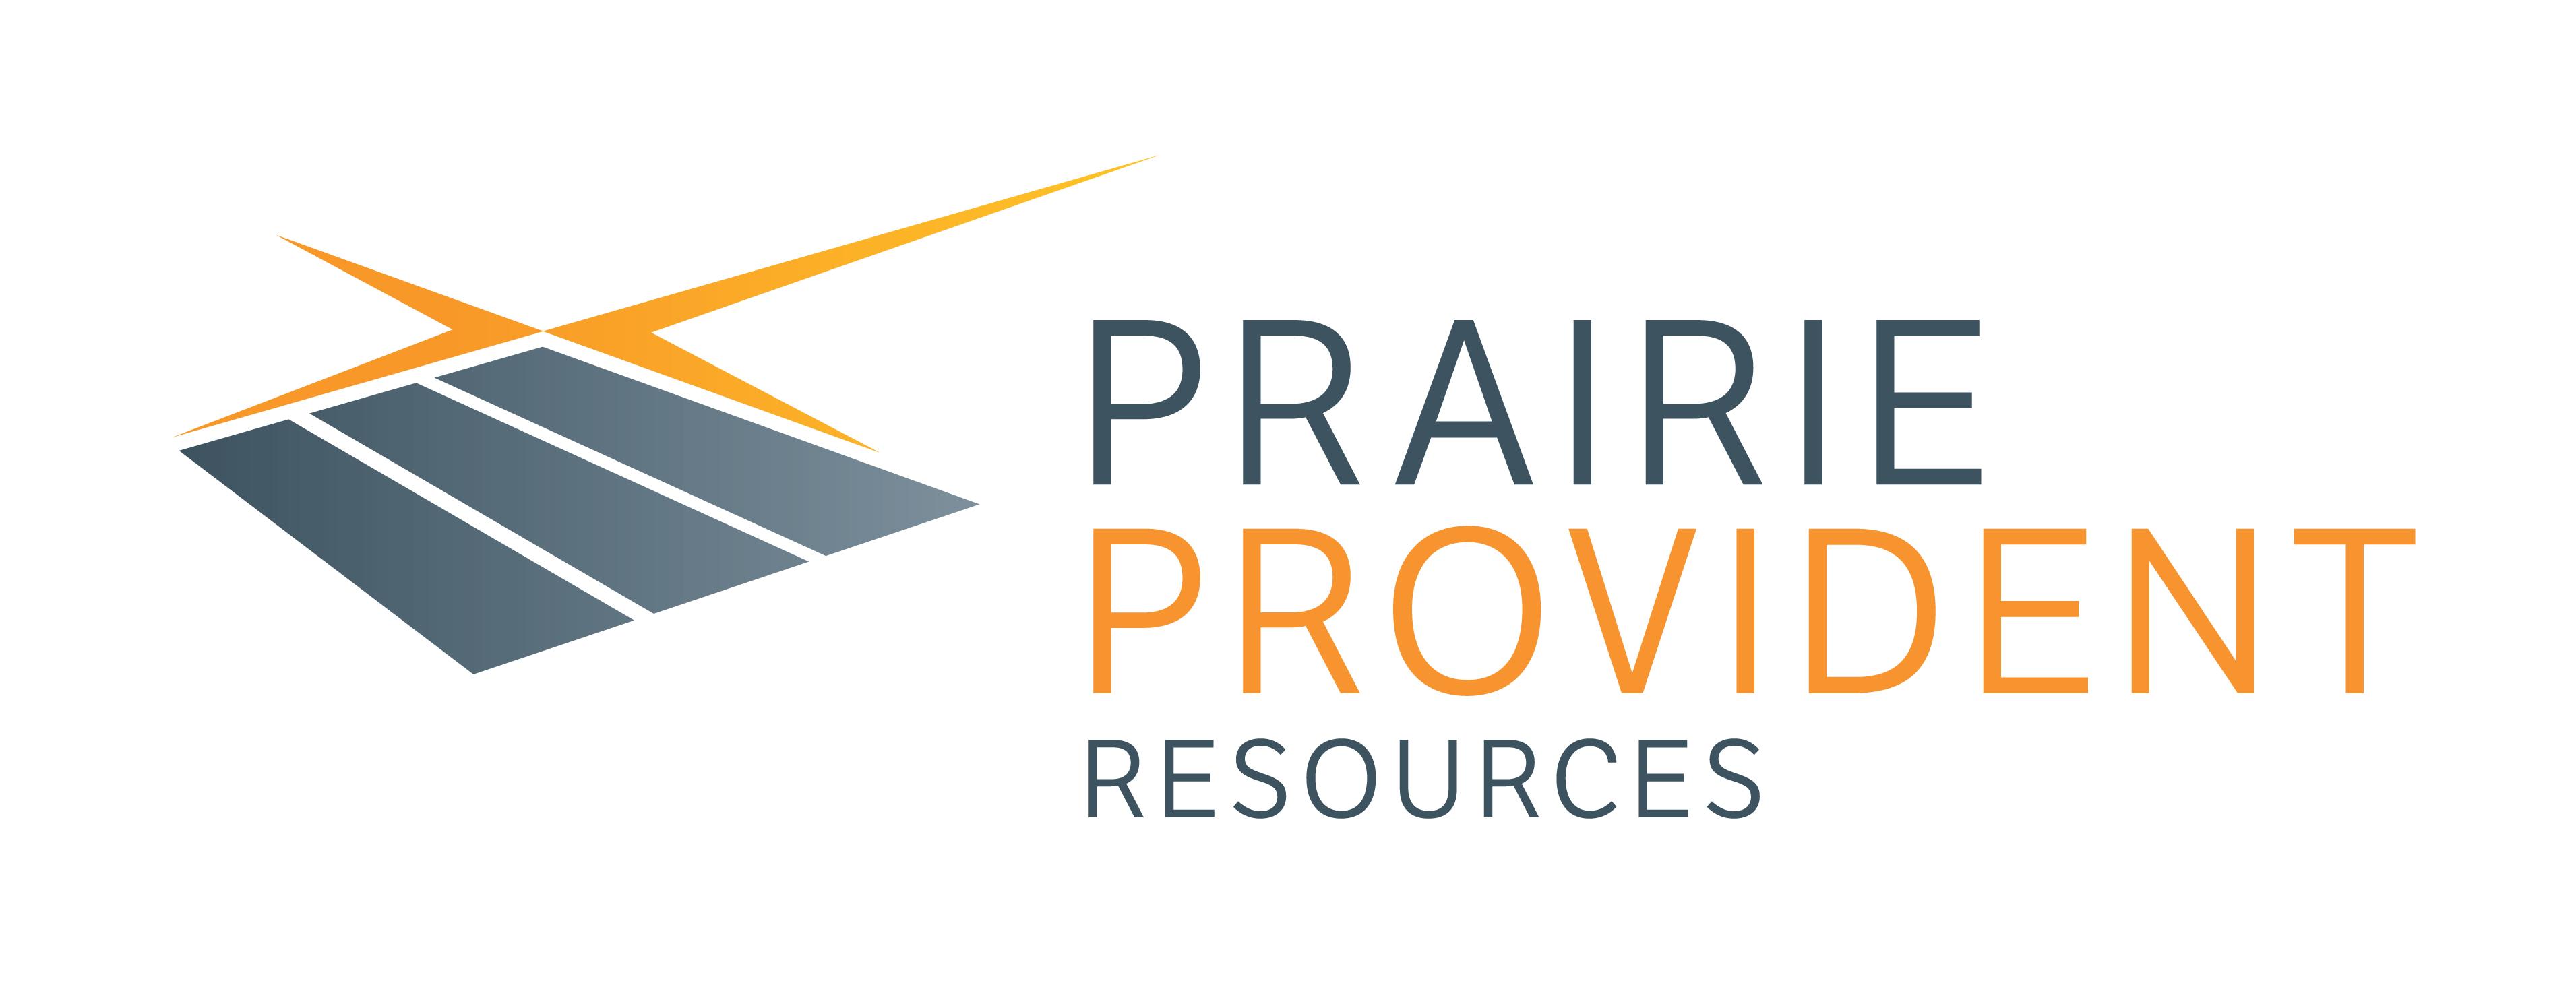 Prairie Provident Resources Canada Ltd. logo